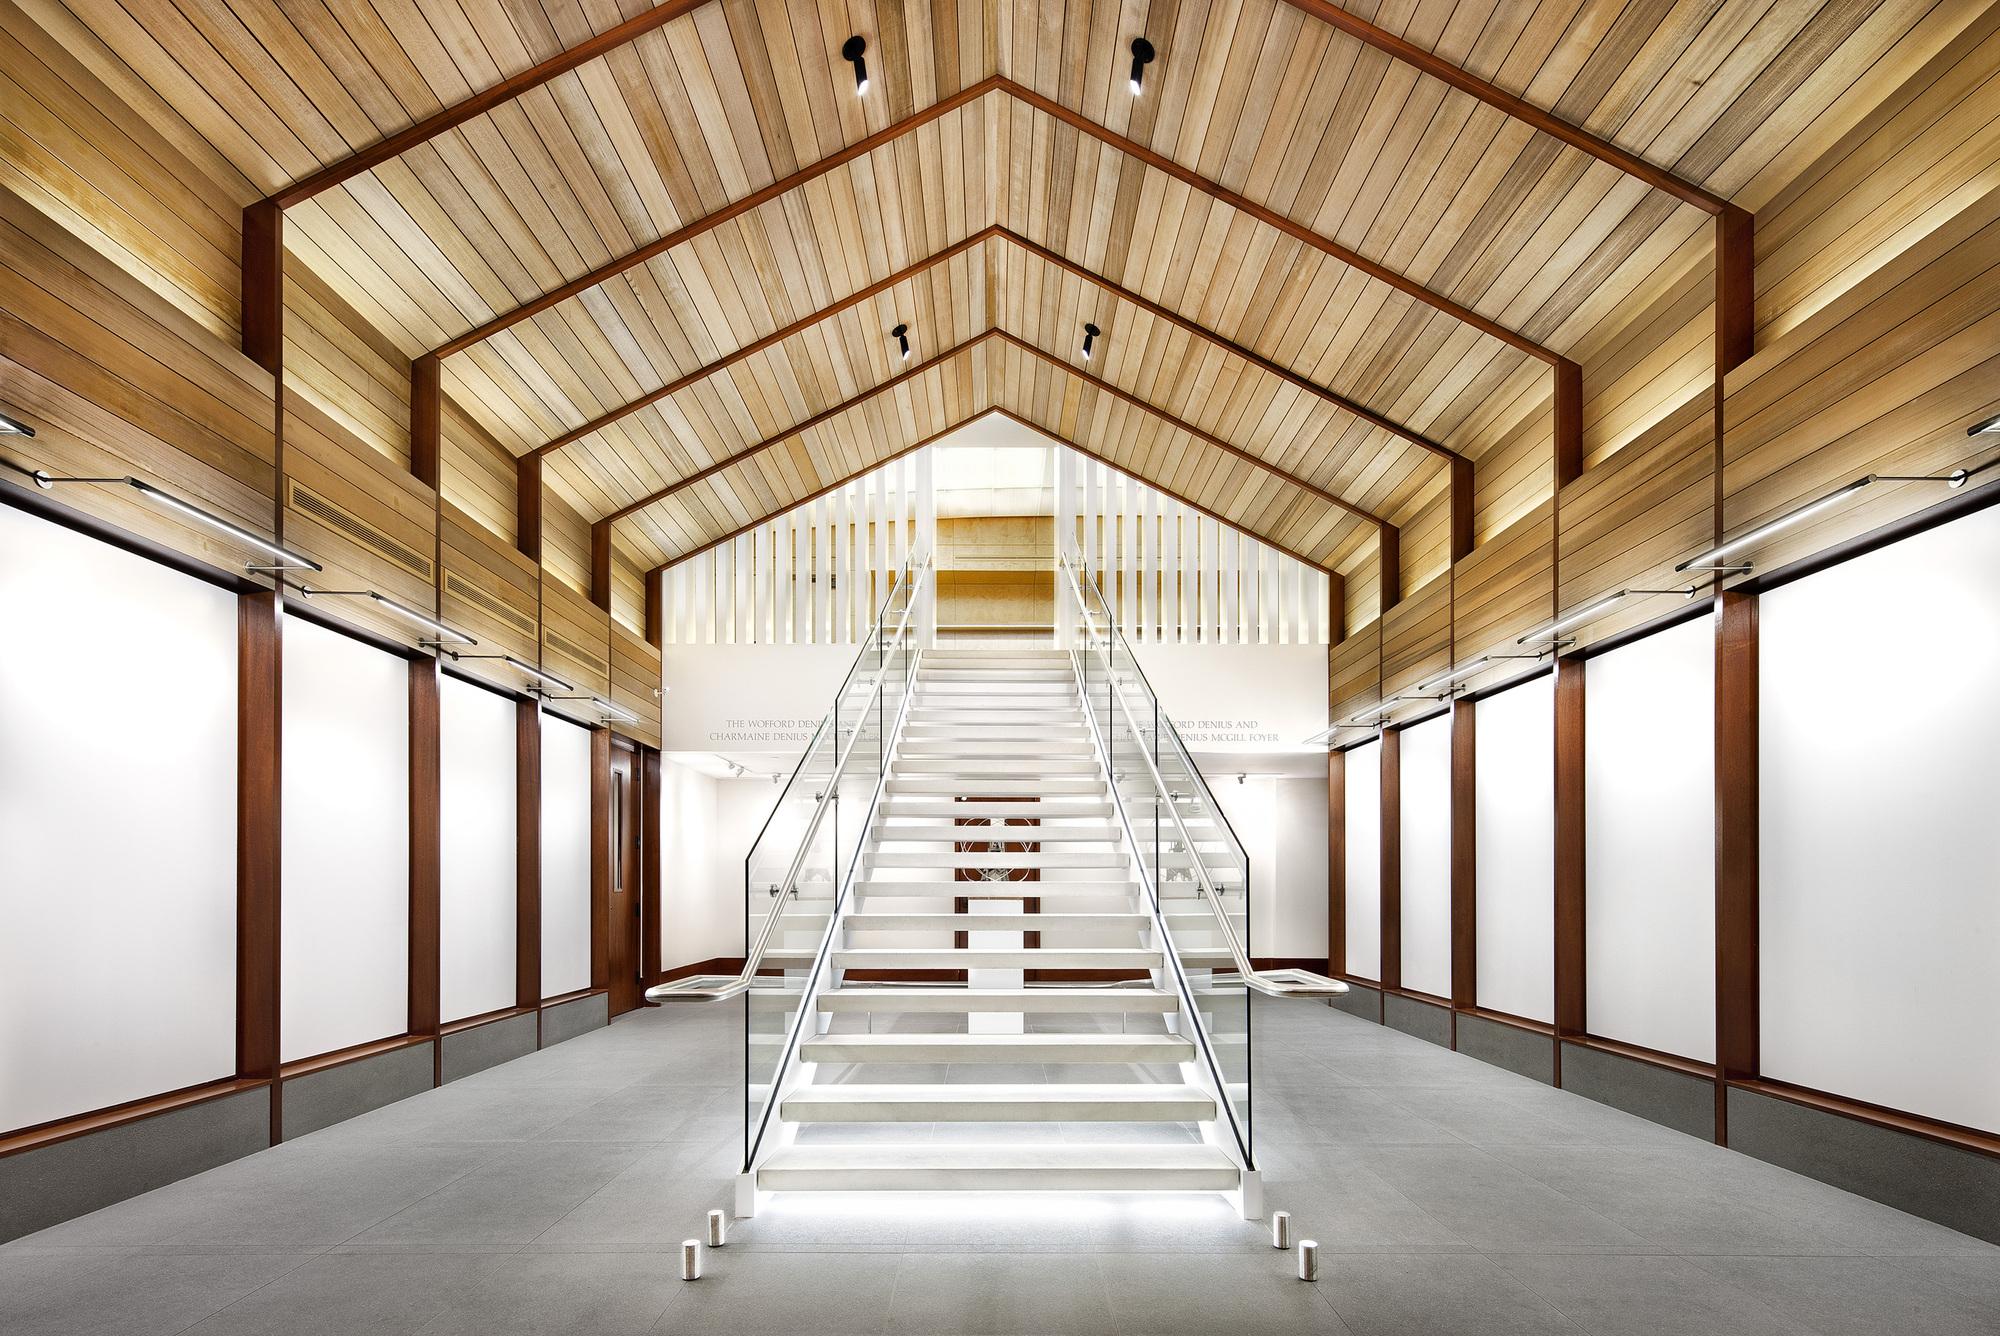 Texas Exes Alumni Center / Miró Rivera Architects